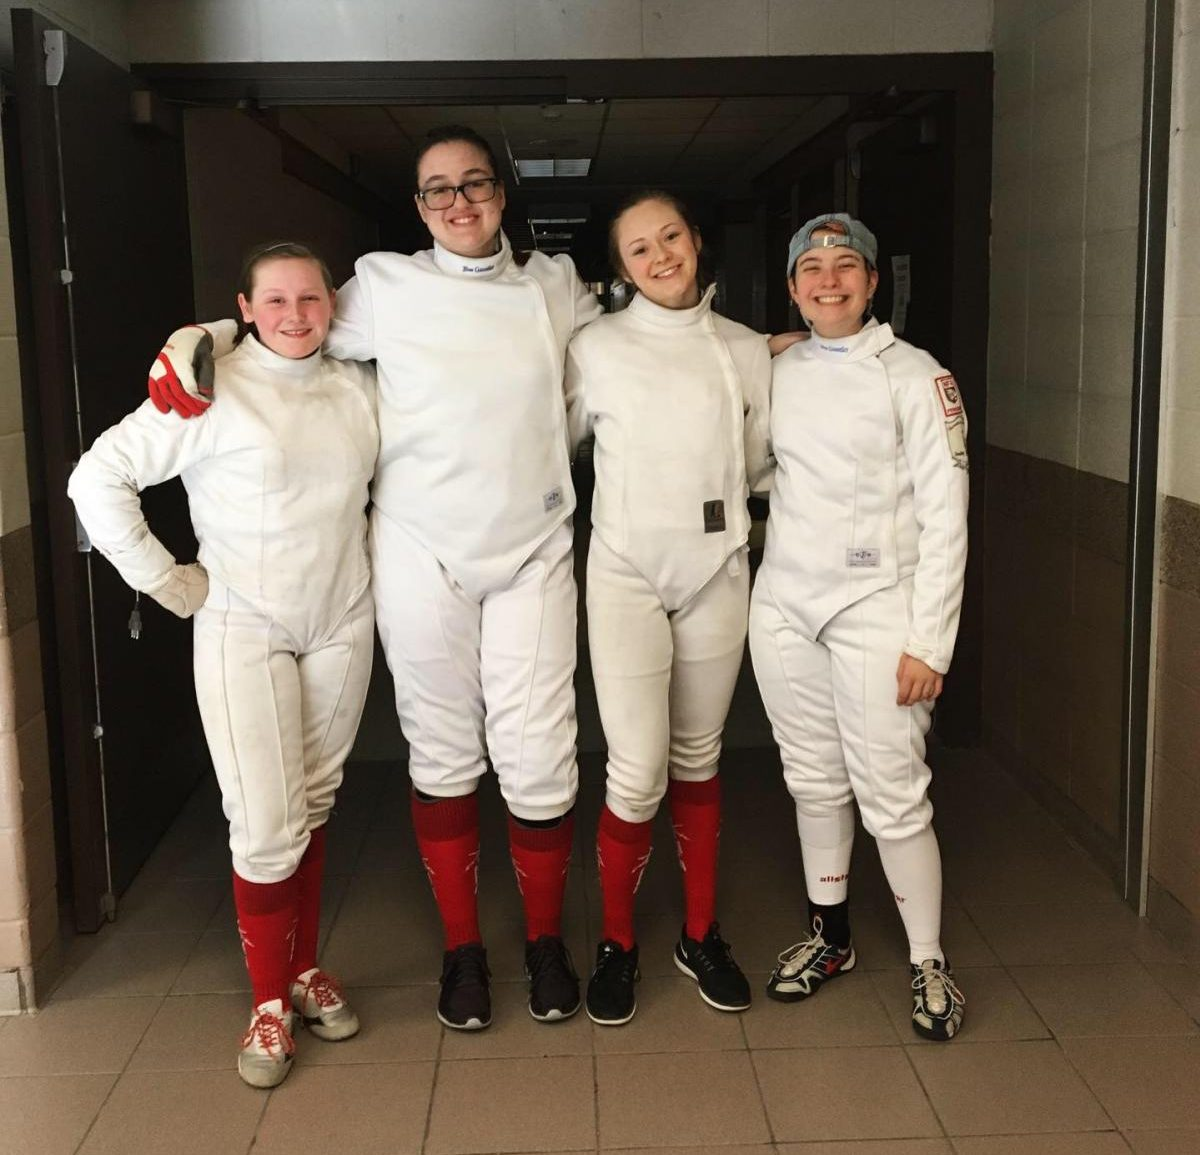 Women's Epee Squad at Team State's Competition From left to right:  Ashlyn Sminkey (upper), Cassandra Zawacki (upper), Phoebe Drupa (senior), Alex Wicken (senior)